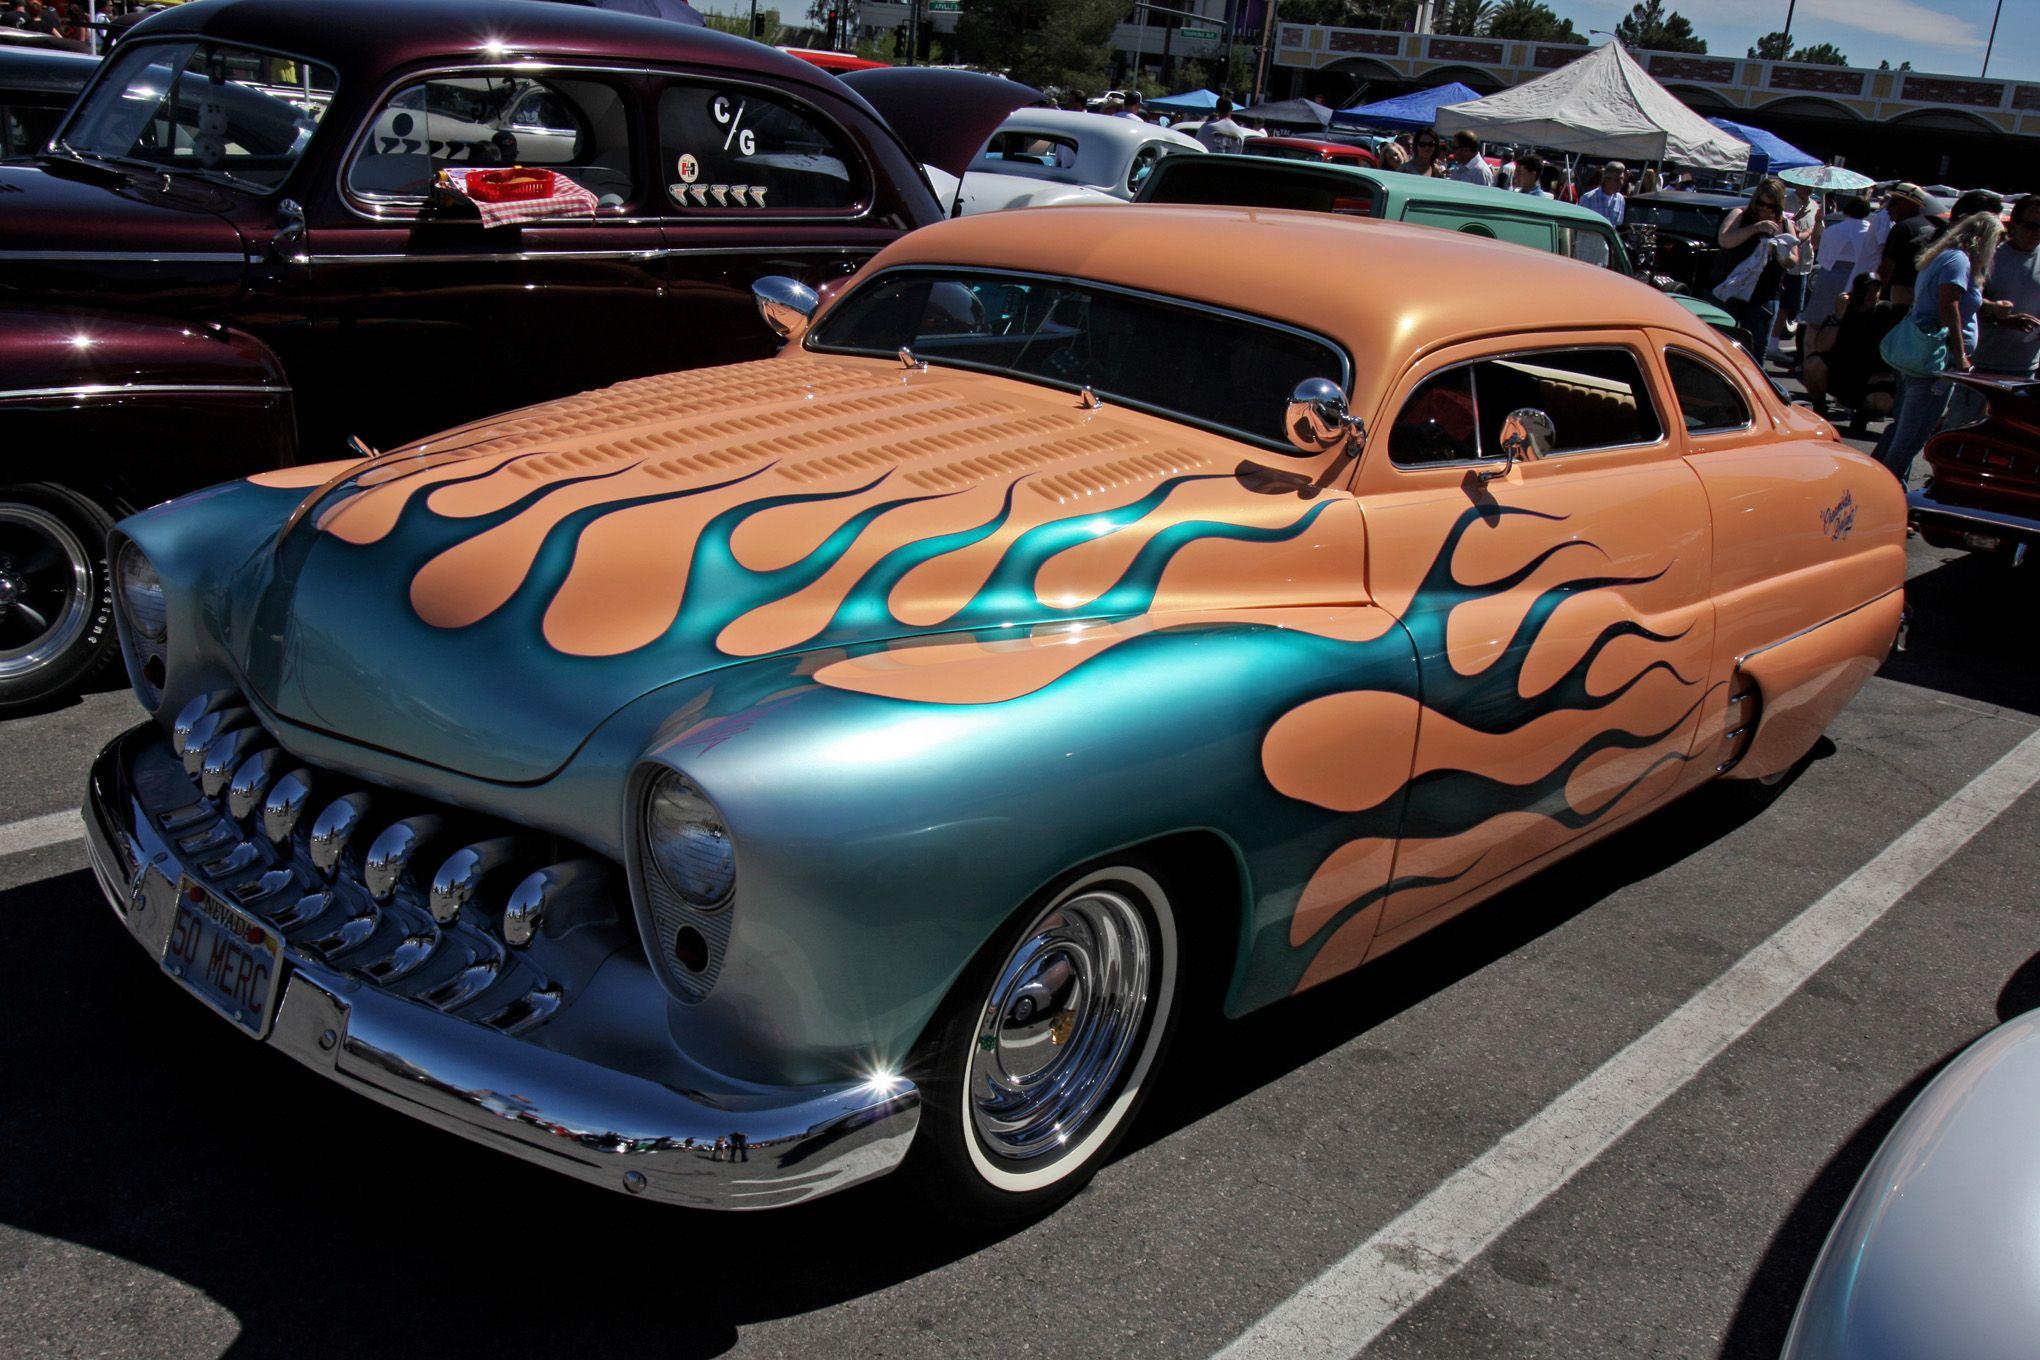 300+ Photos of Vintage American Iron from Viva Las Vegas | Cars